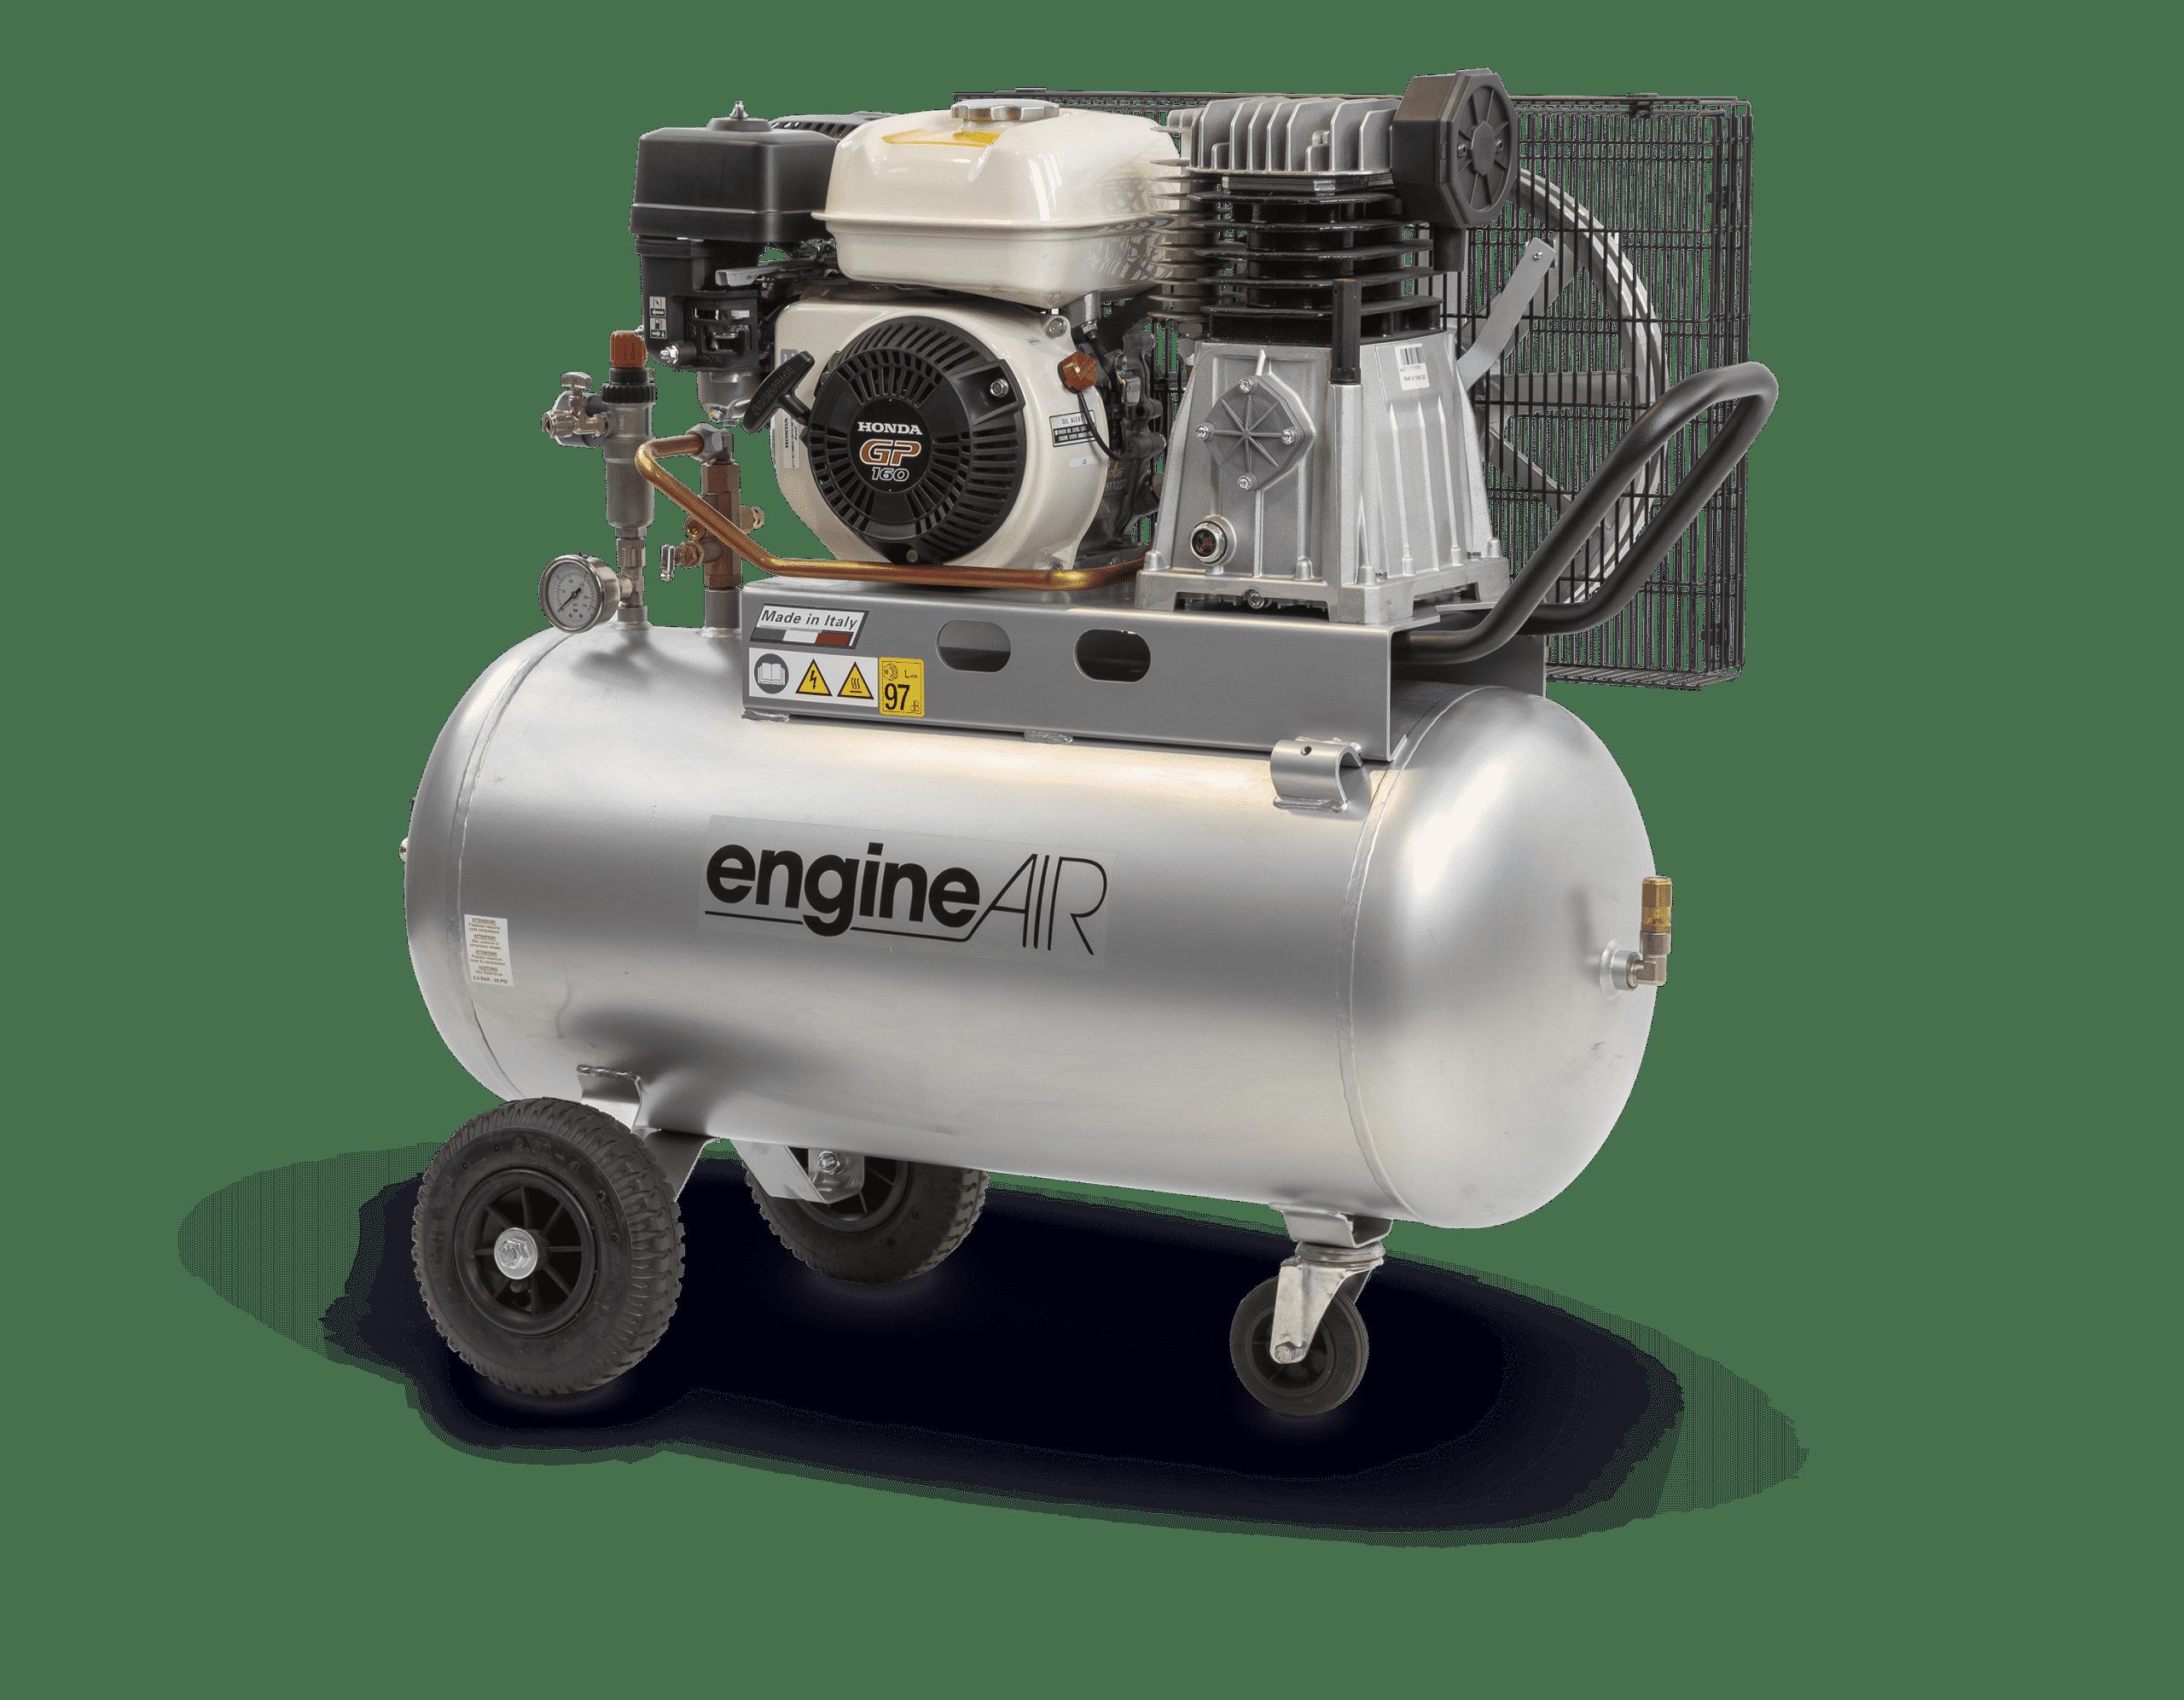 engineAIR 5/100 10 Benzin